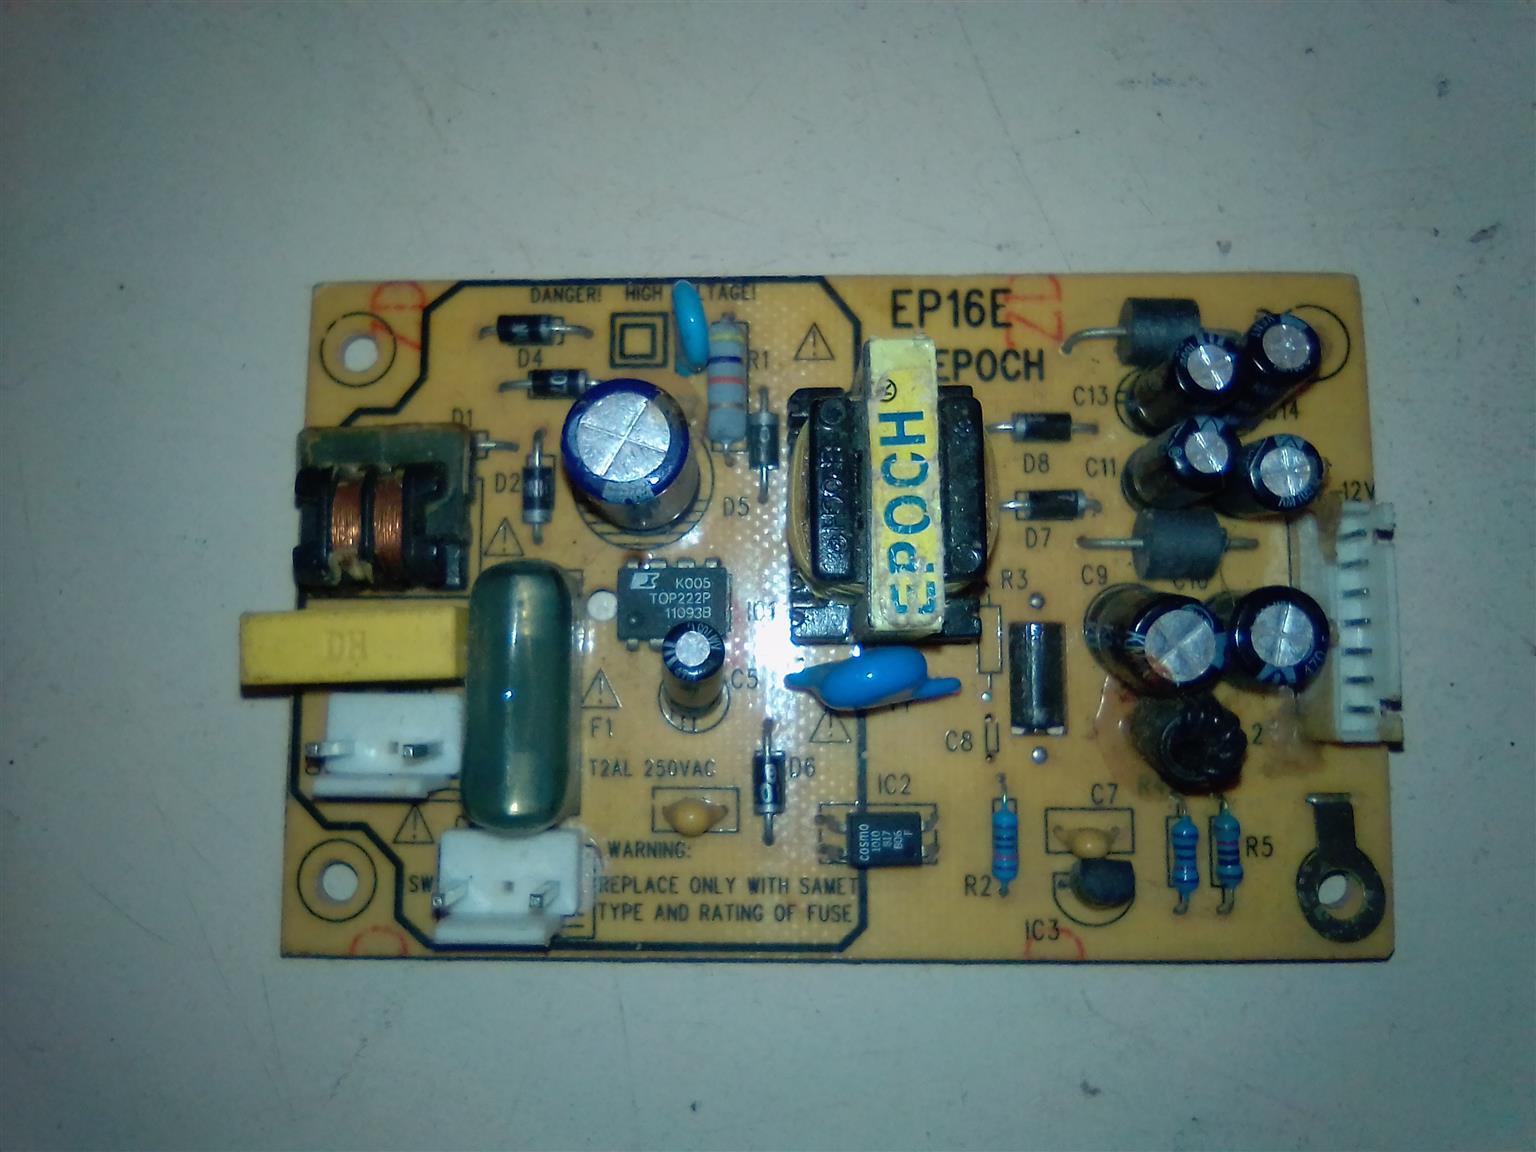 An EP16E EPOCH dvd player power supply board.